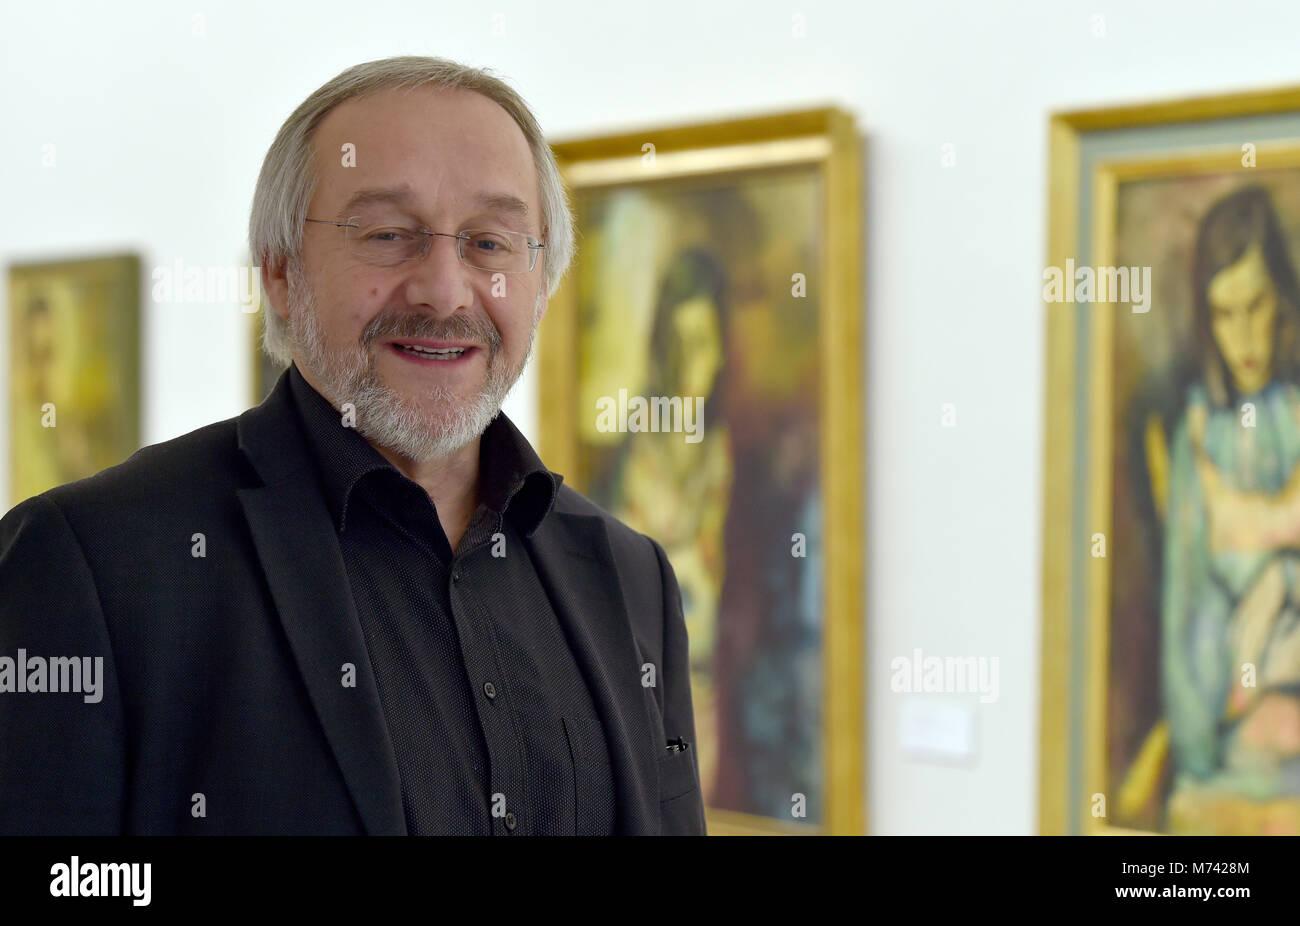 Rolf Frankfurt 08 march 2018 germany solingen the director of the solingen